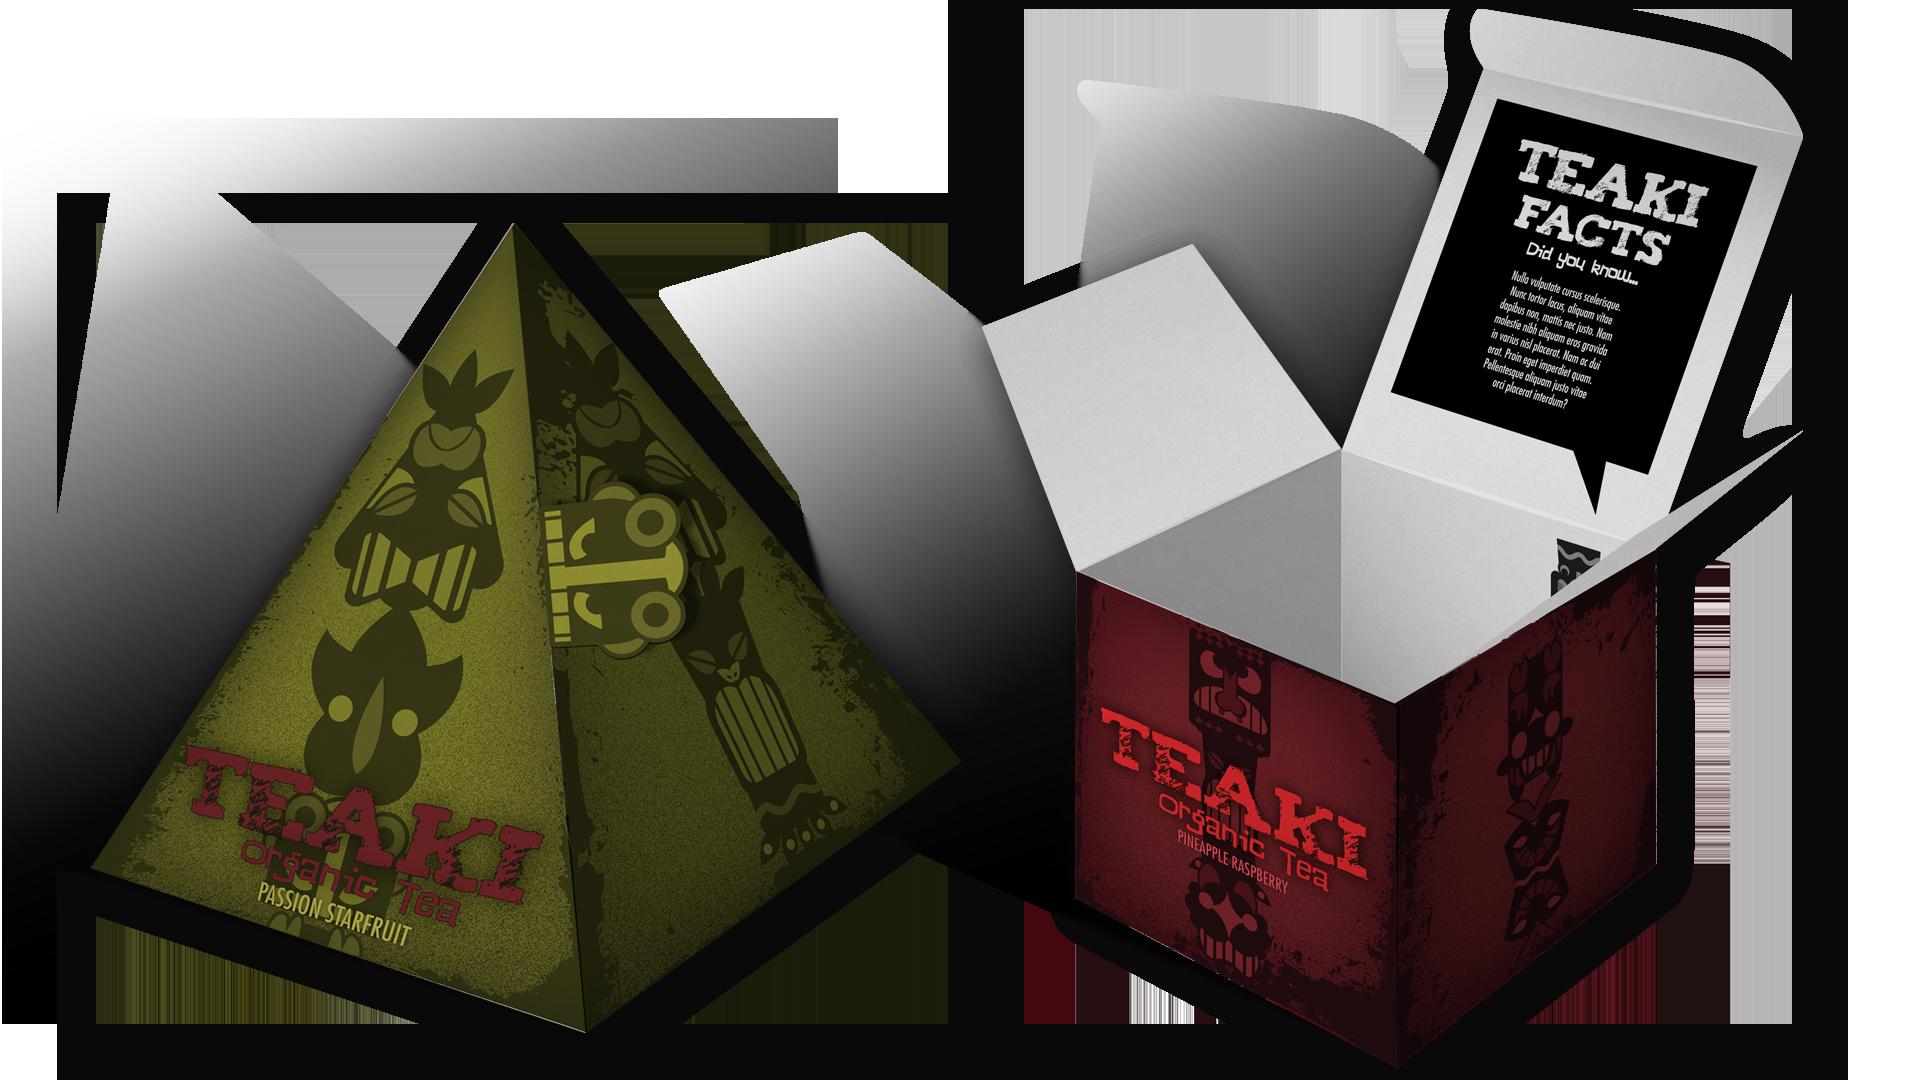 Teaki Pyramid Box Mock Up